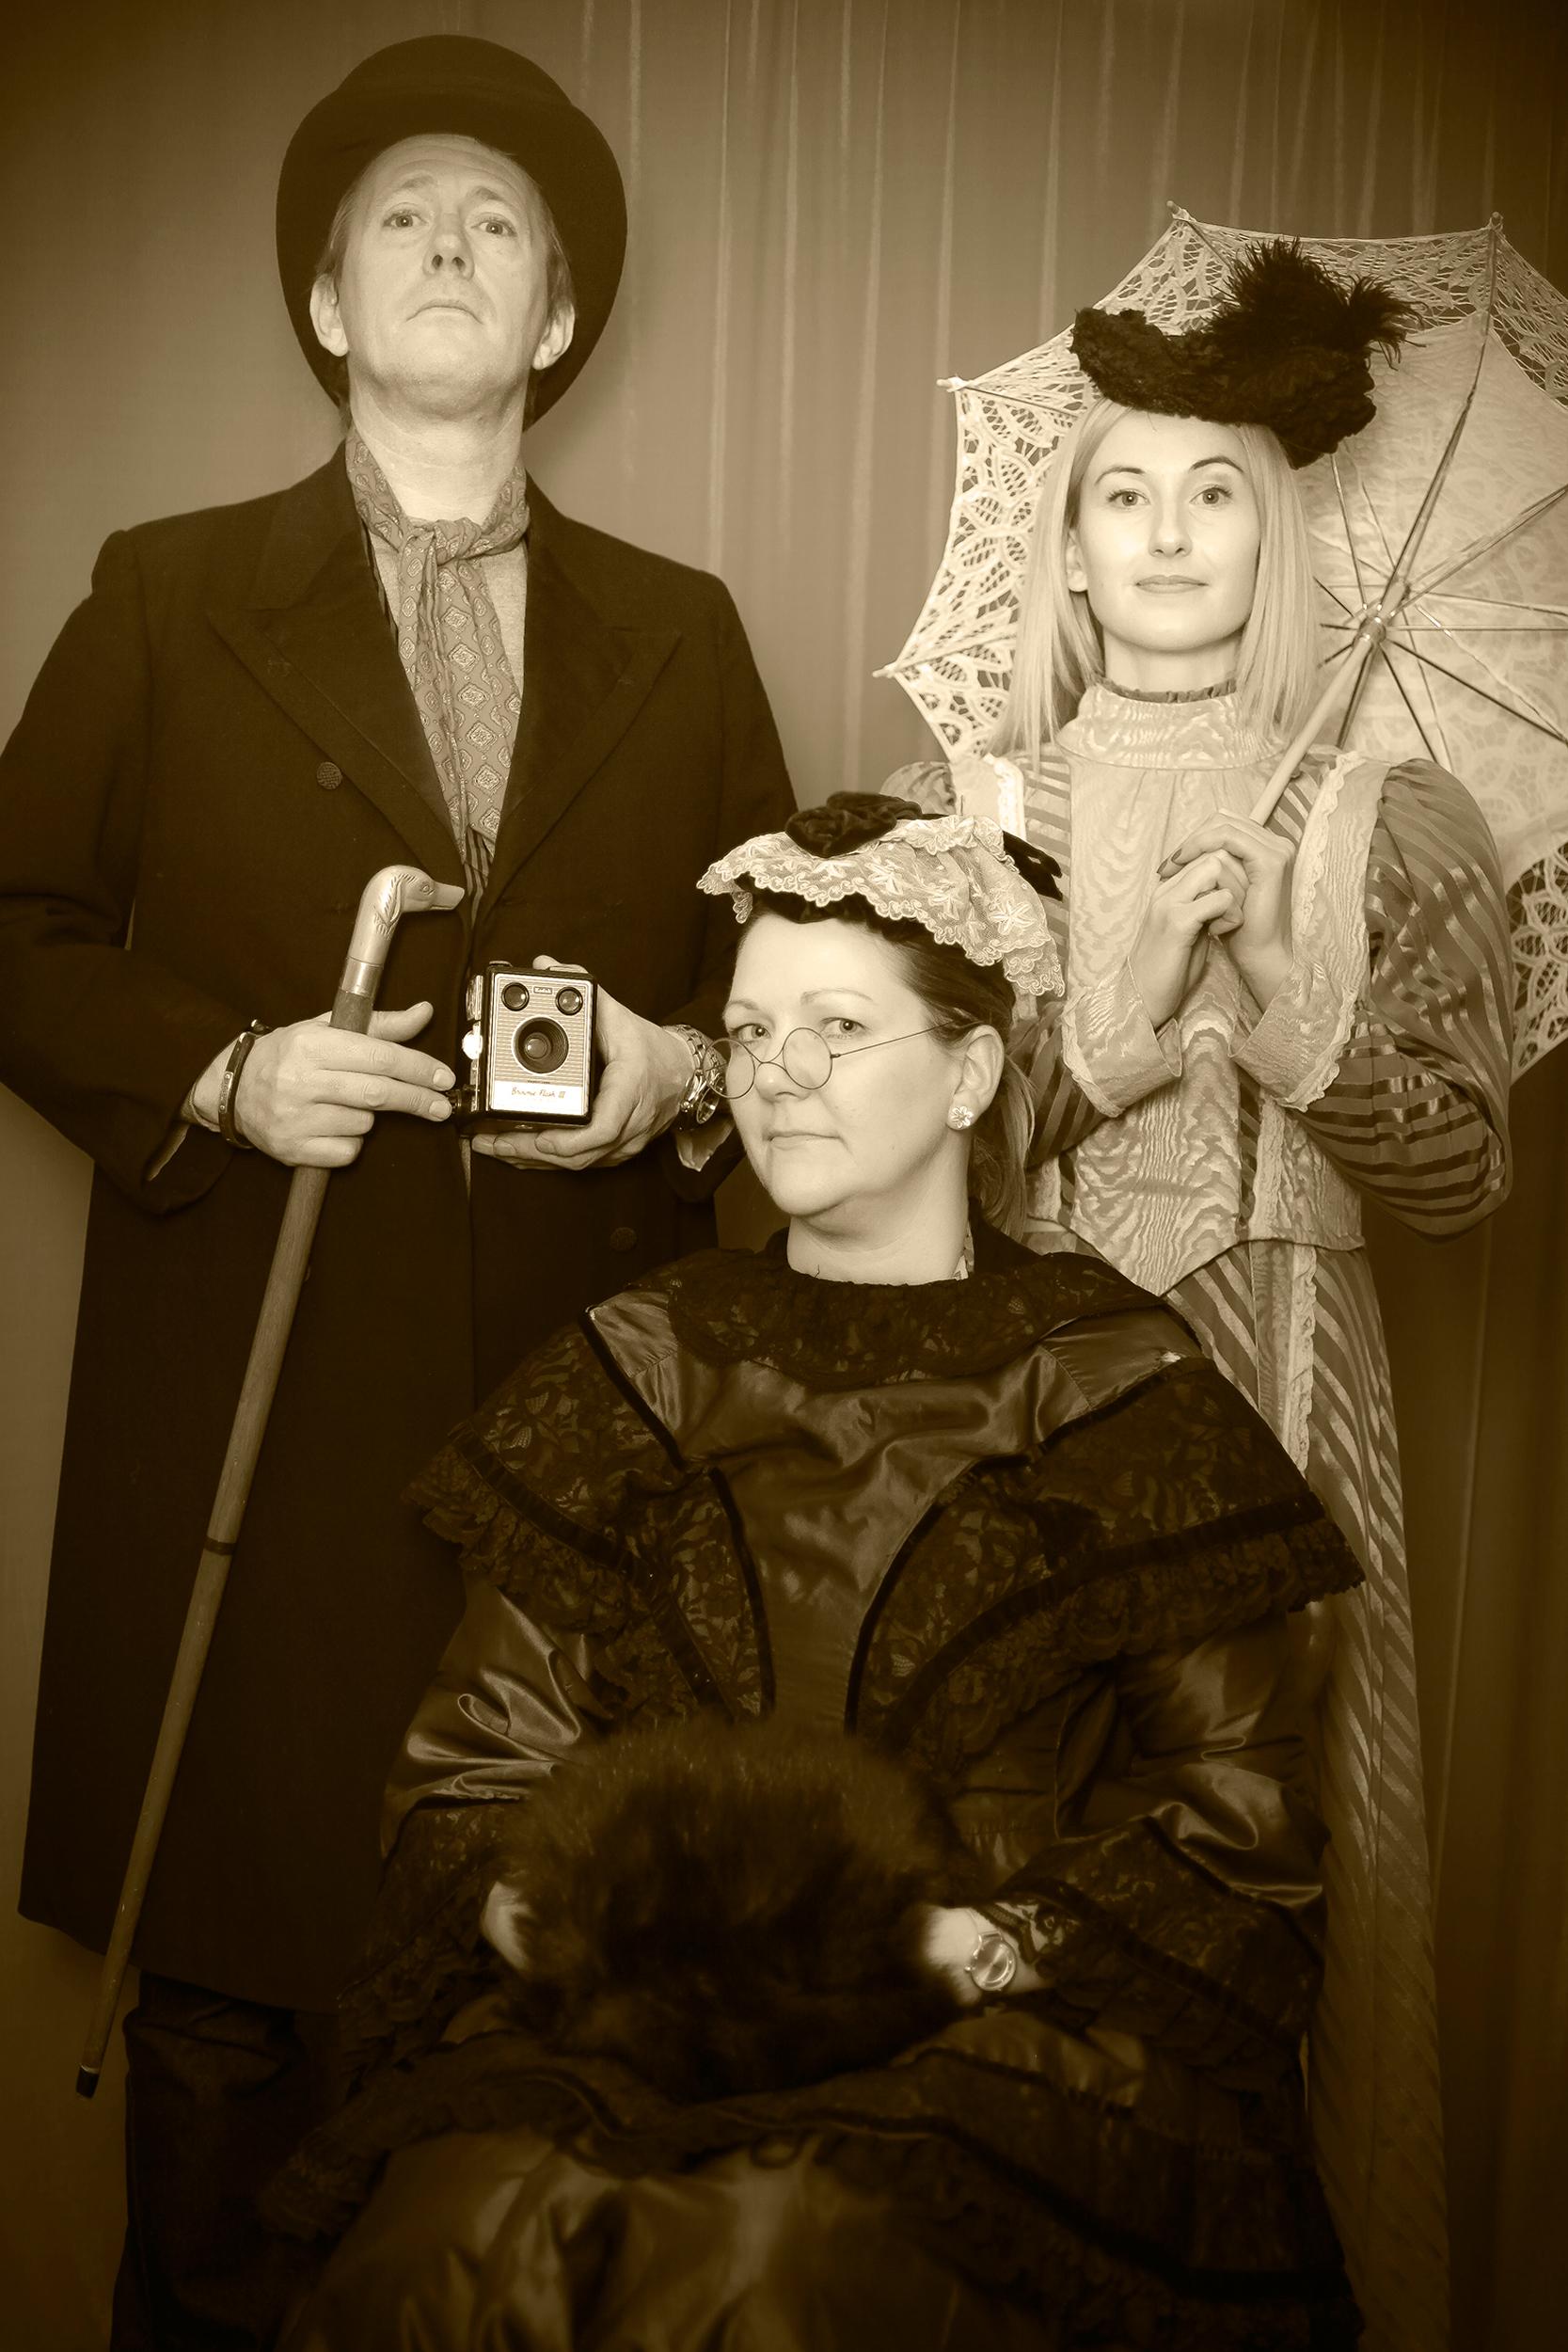 Gladys-&-the-Bubblettes-Photo-Booth-Scotland_238.jpg